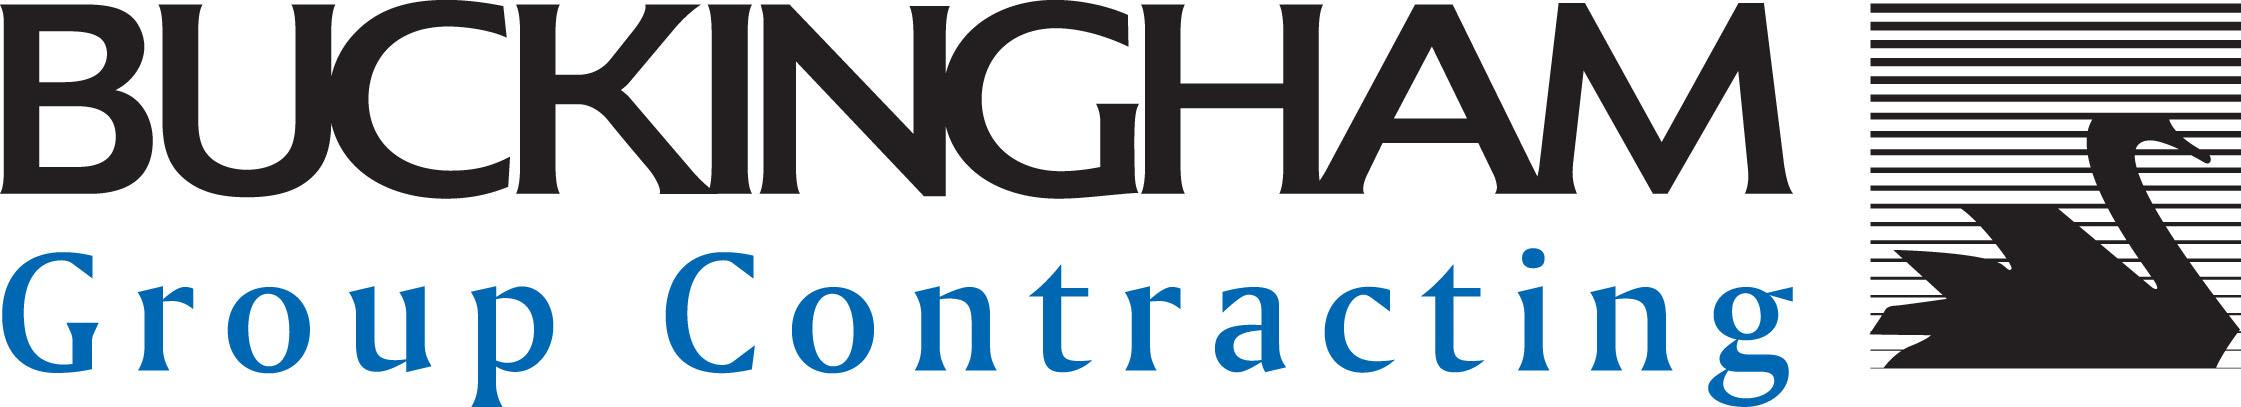 Buckingham Group Contracting